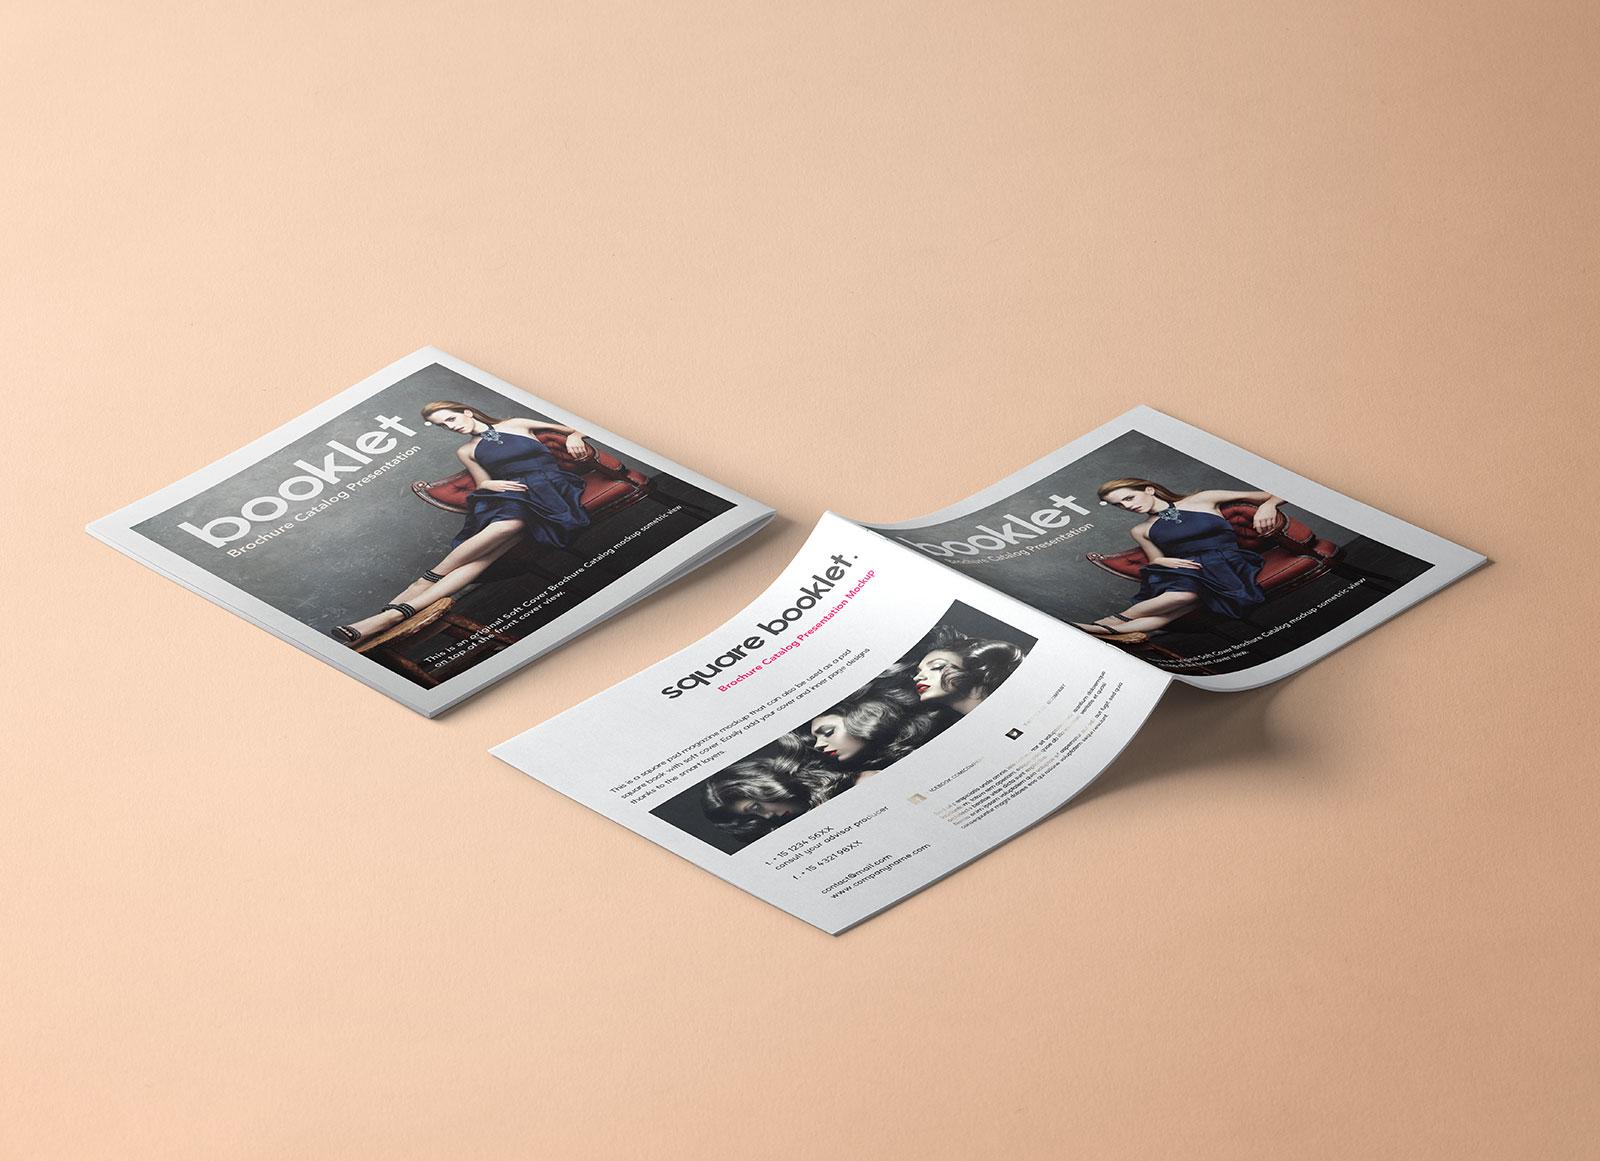 Free-Square-Title-Back-Booklet-Brochure-Mockup-PSD